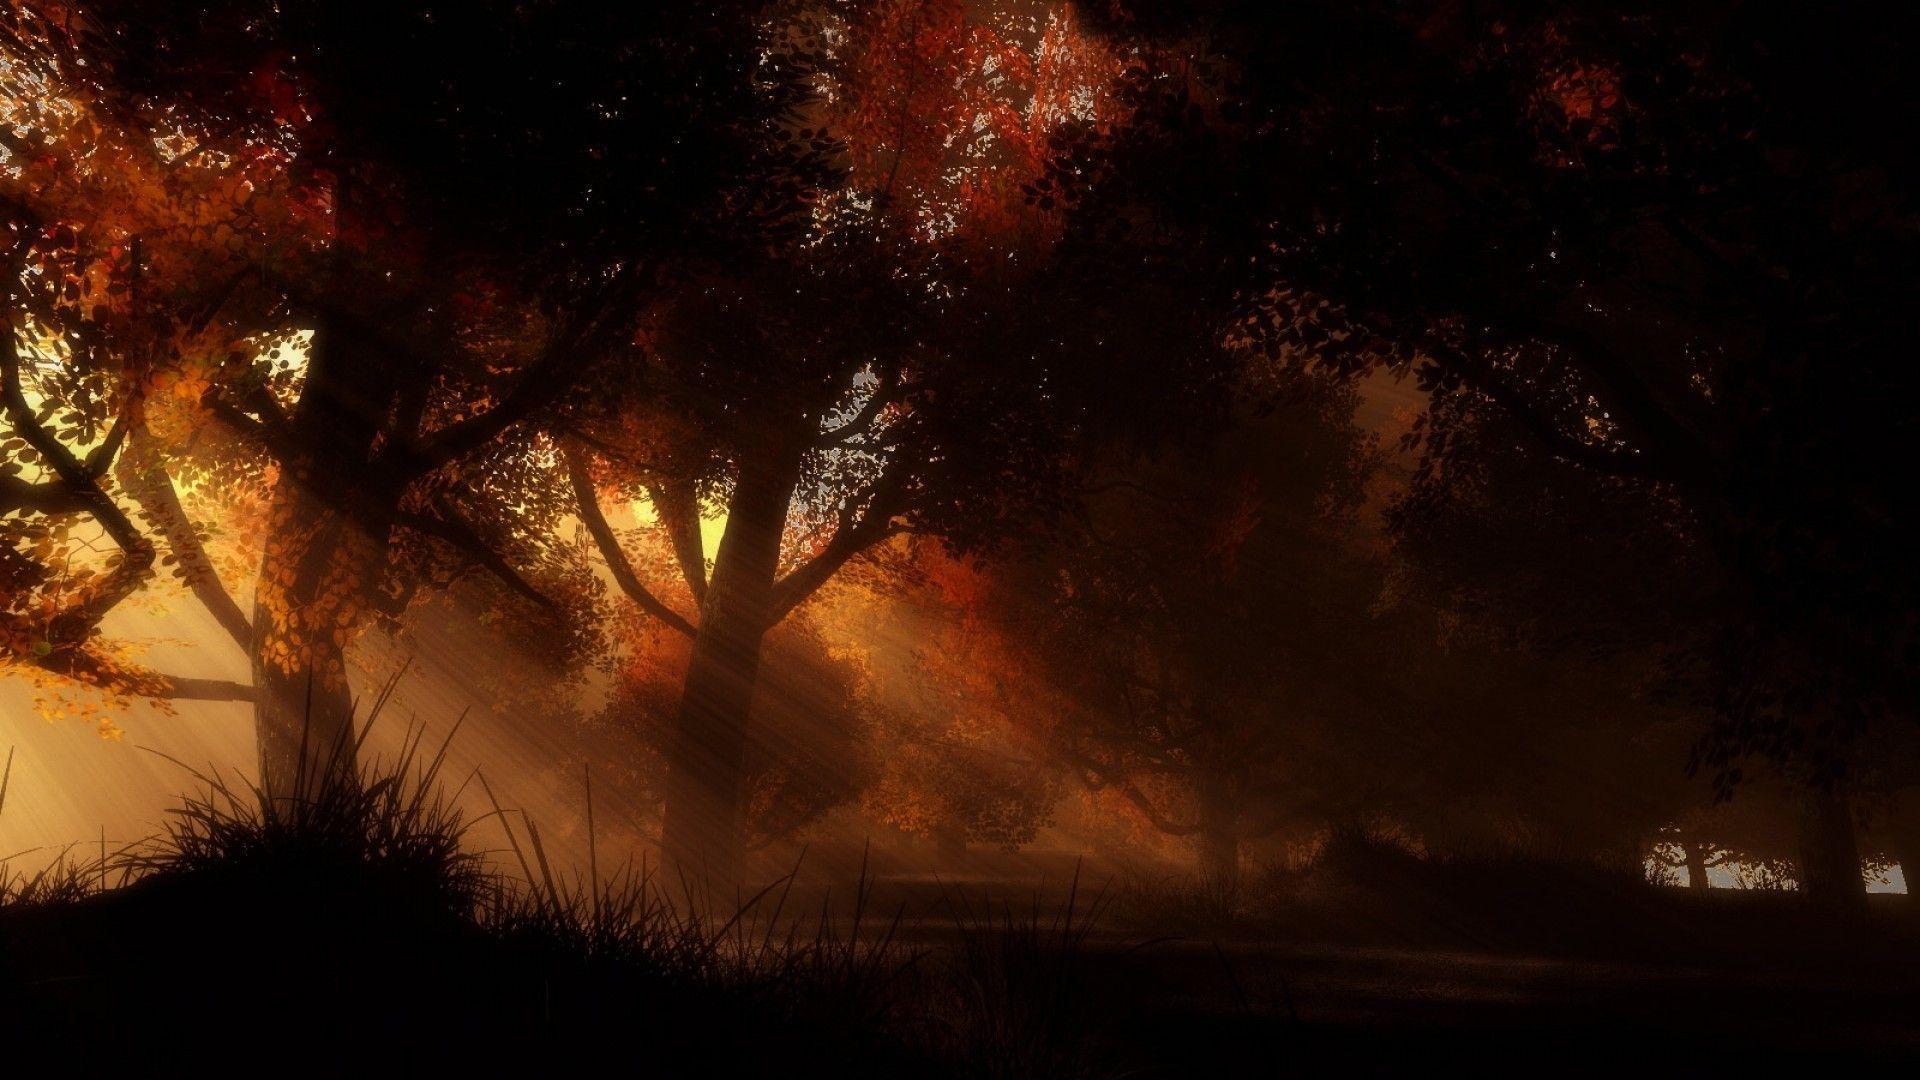 Dark Autumn Wallpapers Top Free Dark Autumn Backgrounds Wallpaperaccess